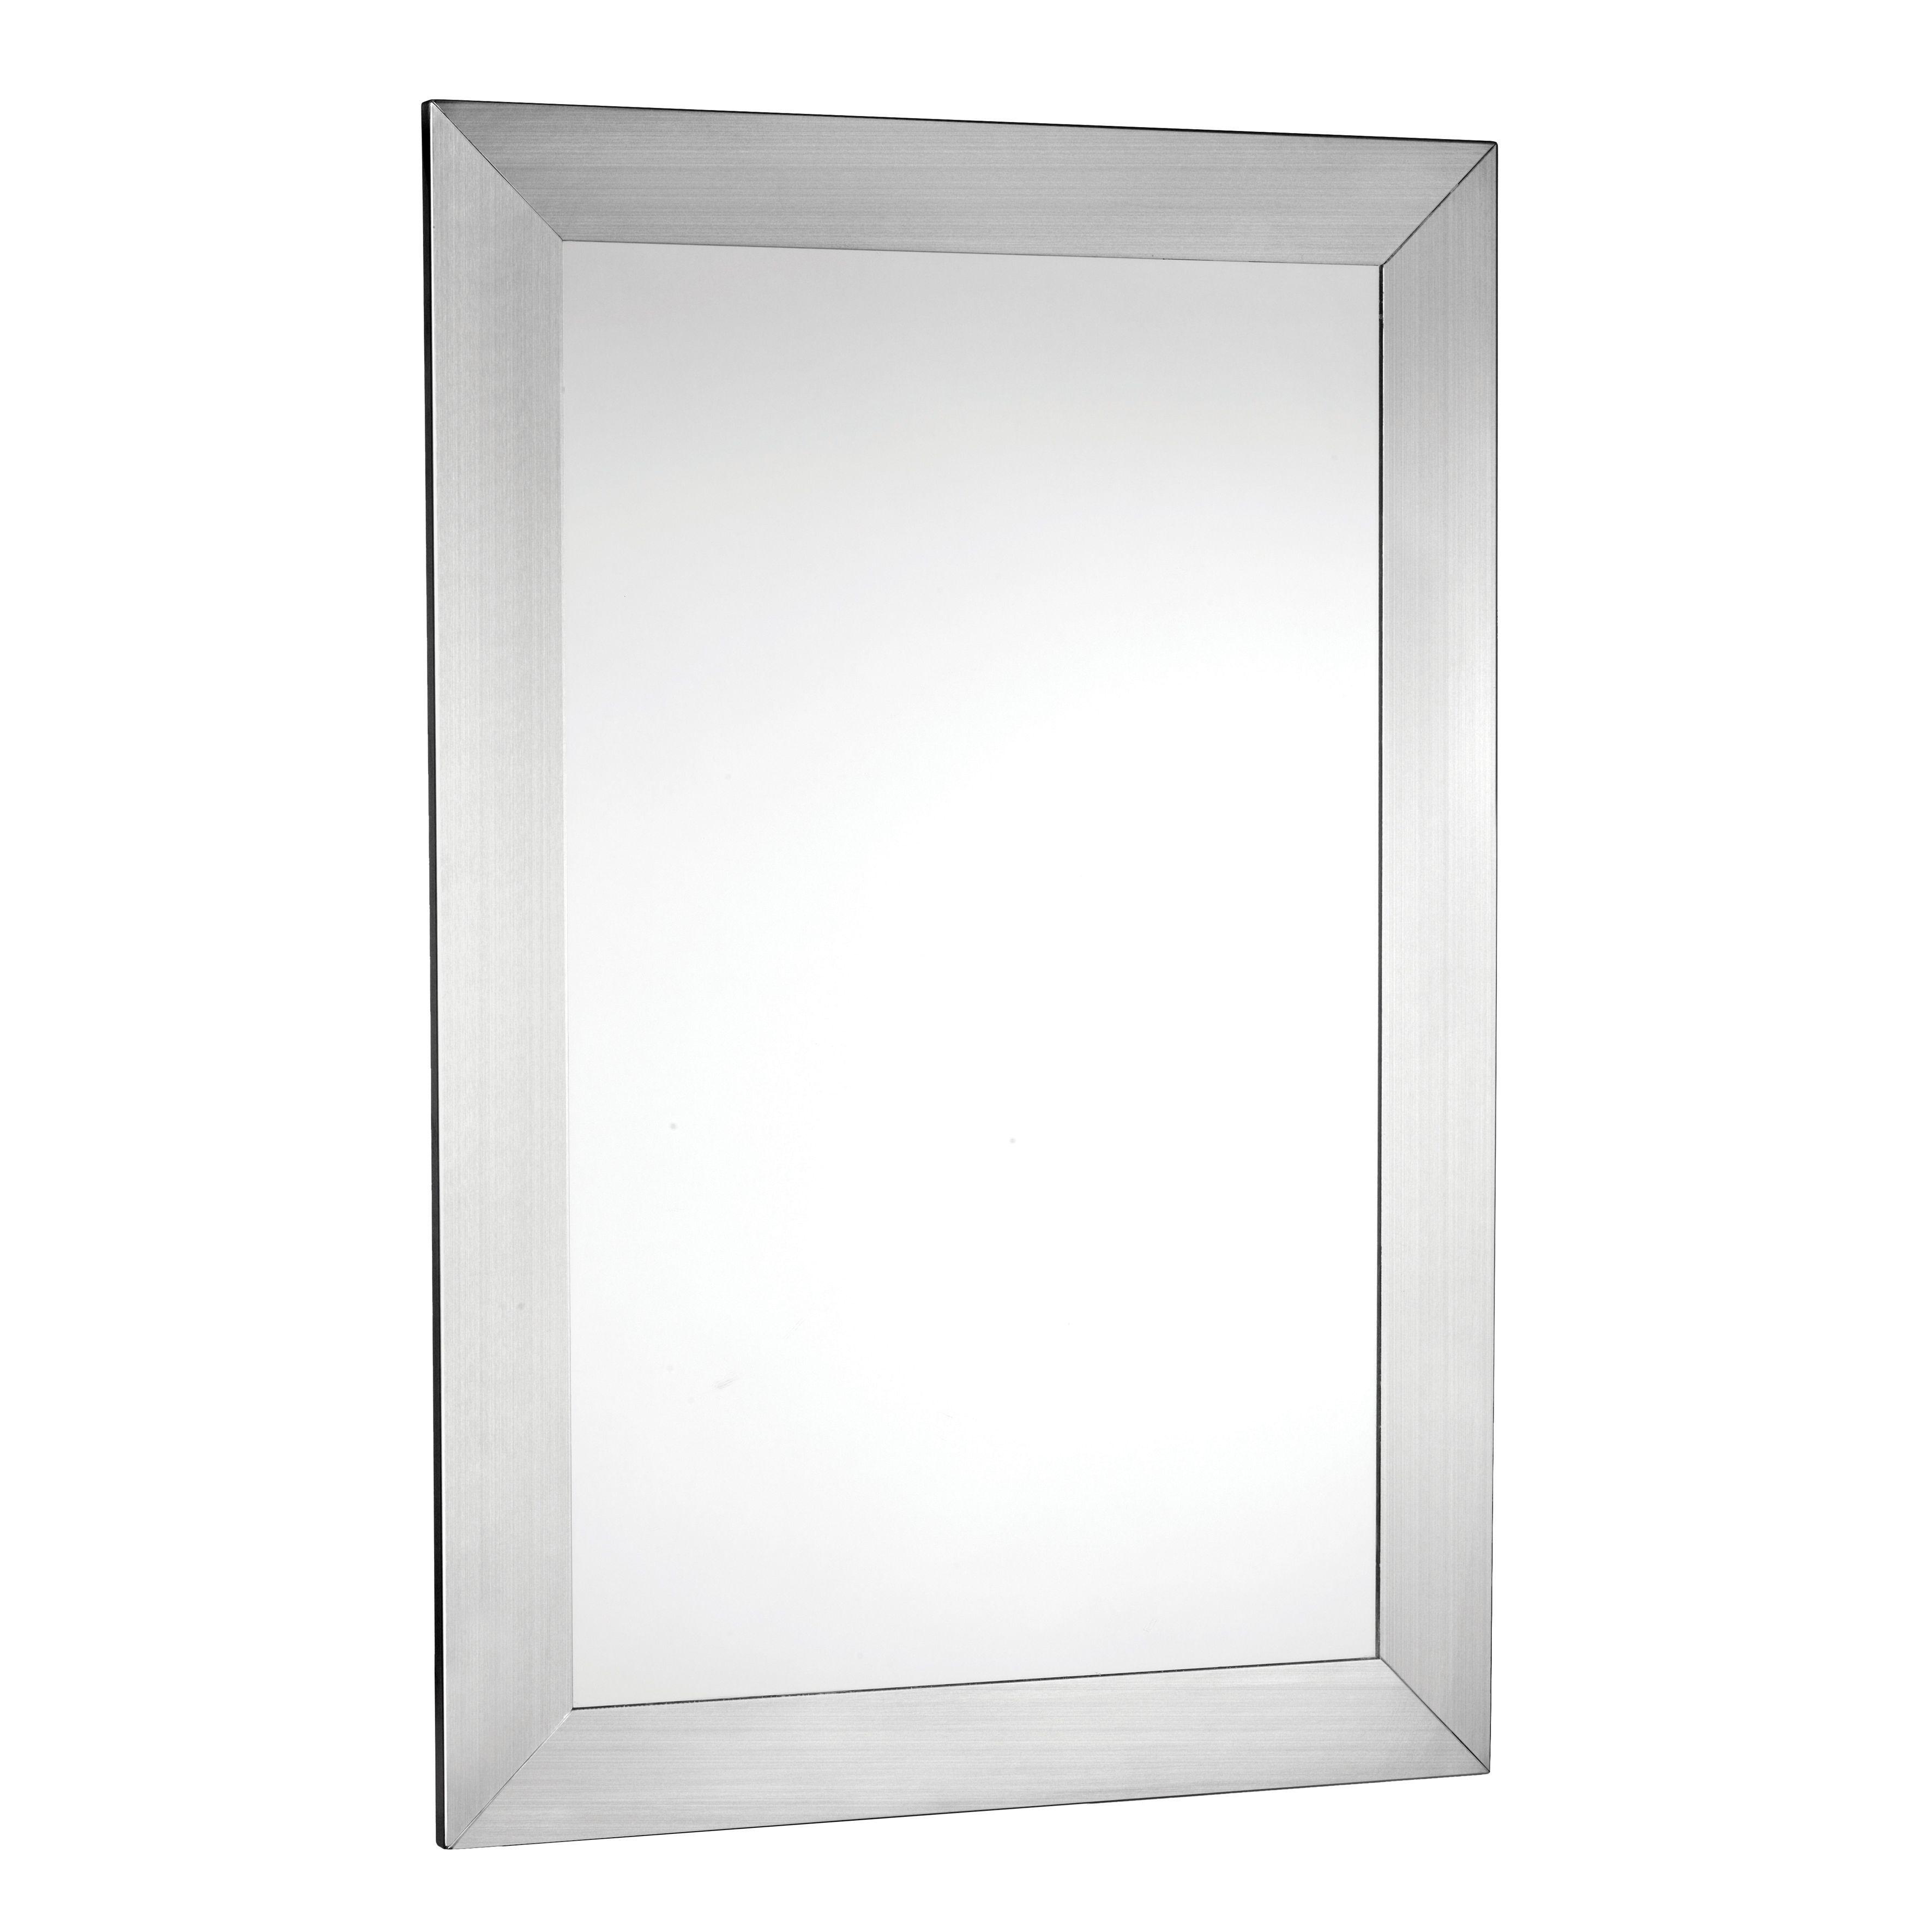 Croydex Hang'n'lock Parkgate Rectangular Wall Mirror (w)610mm (h)920mm